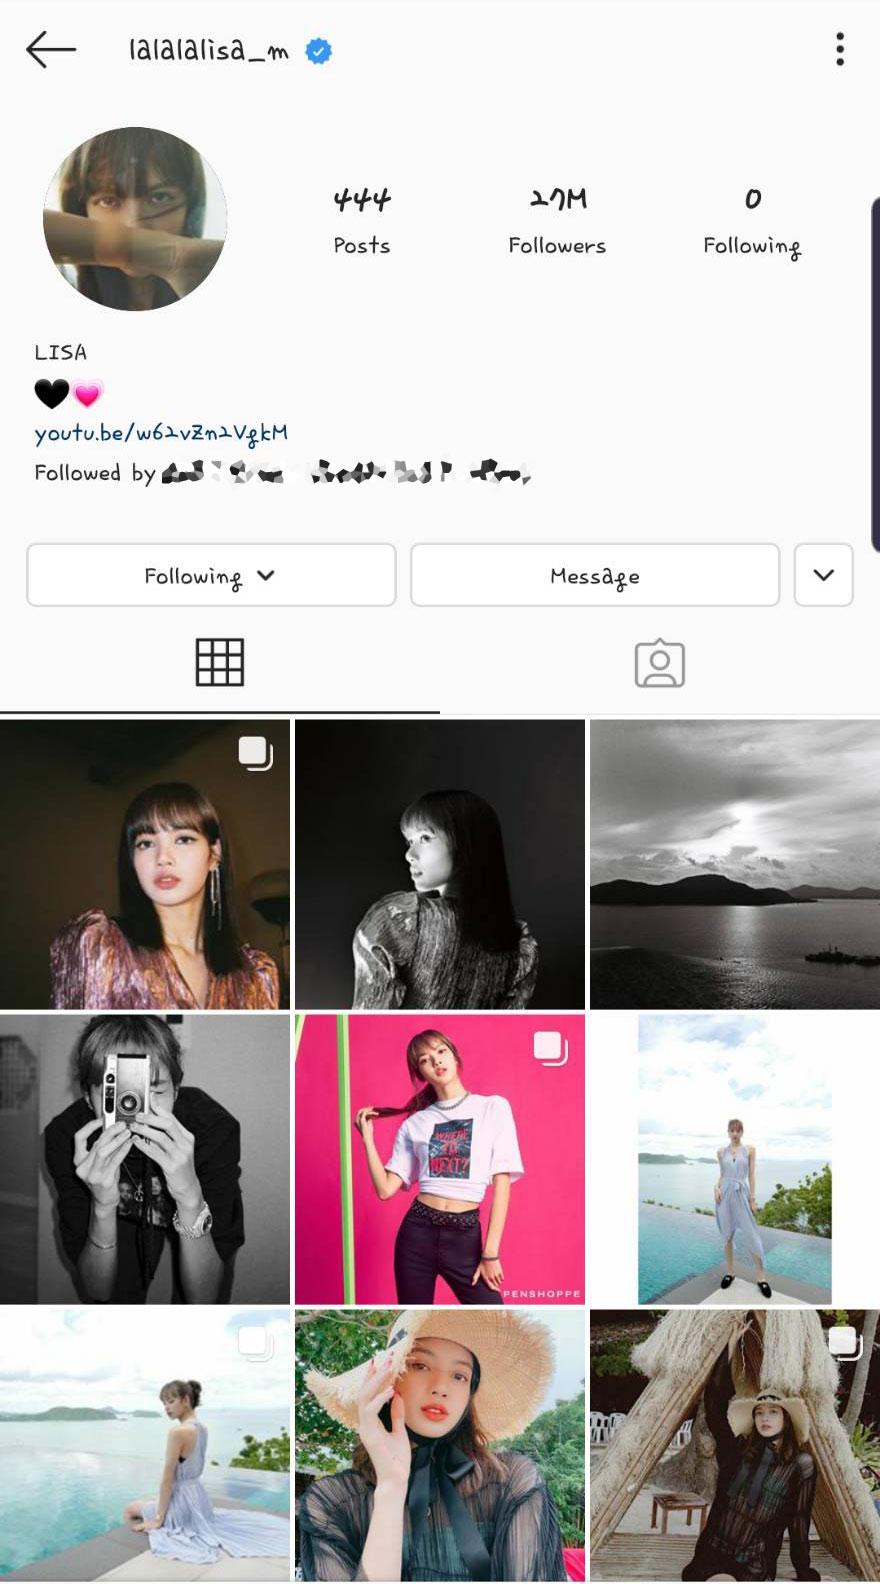 Lisa-Instagram-27m